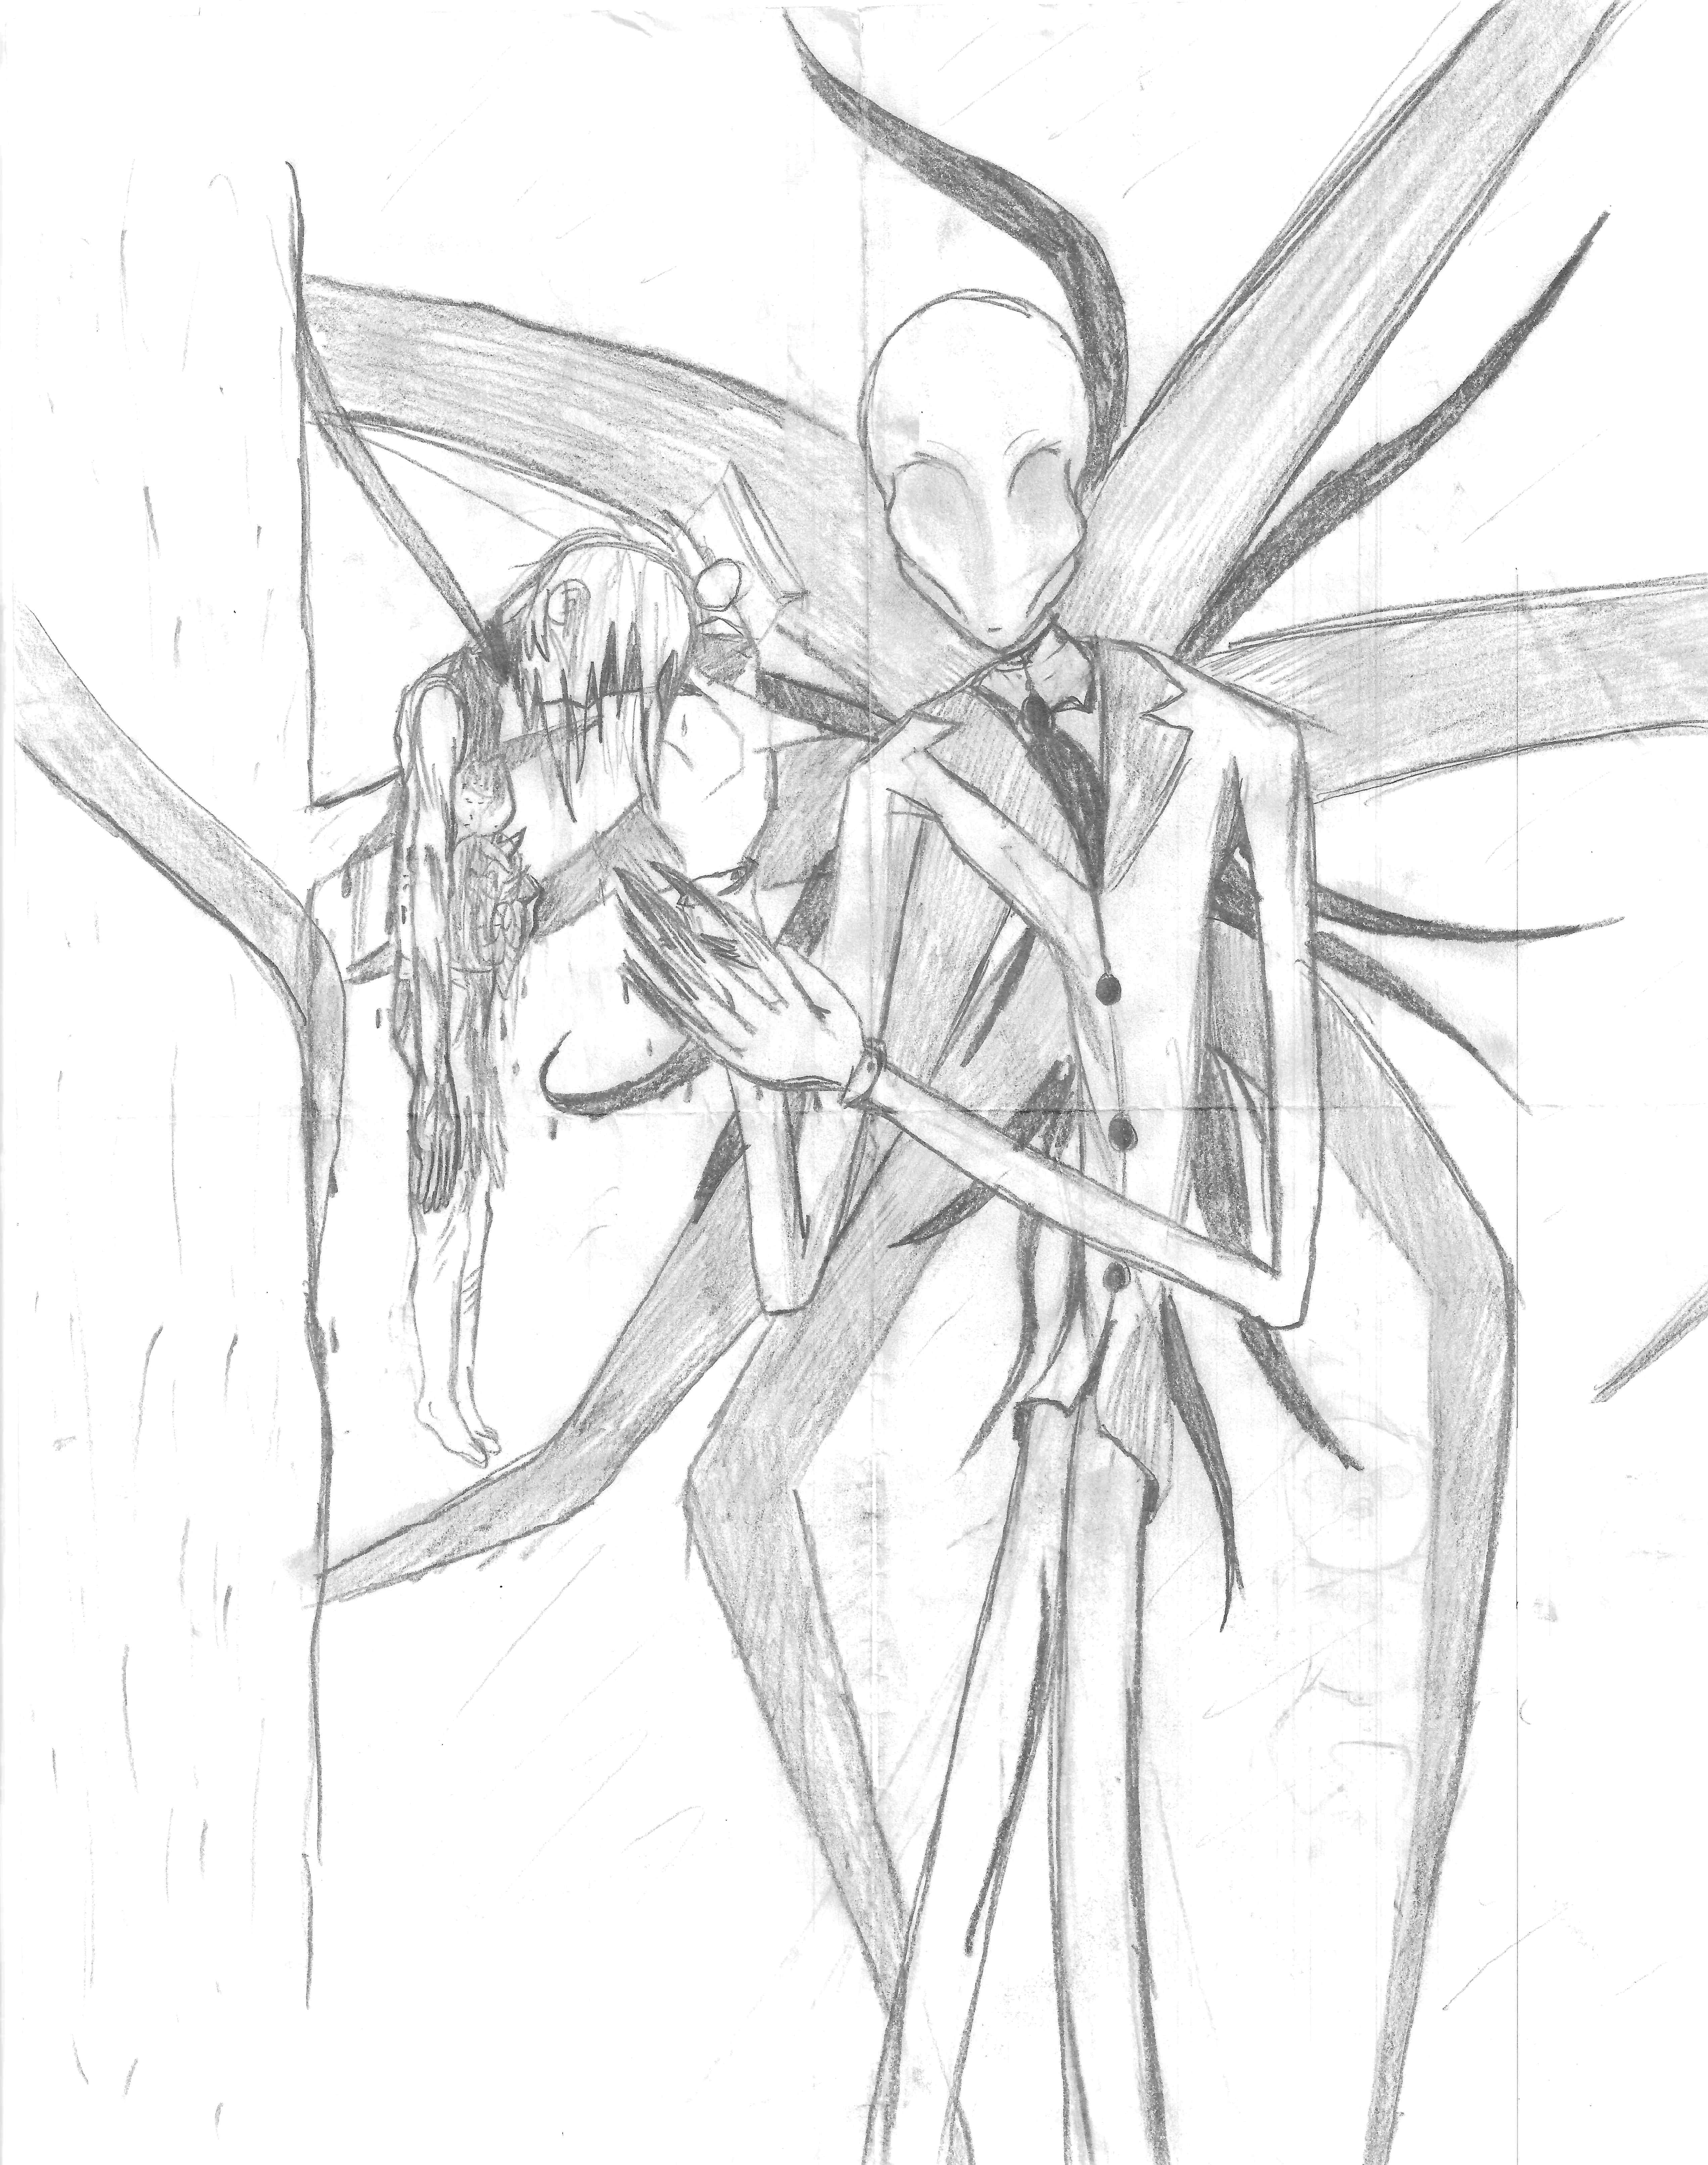 Drawn slenderman alien © Drawing Drawing Slenderman nitsua13